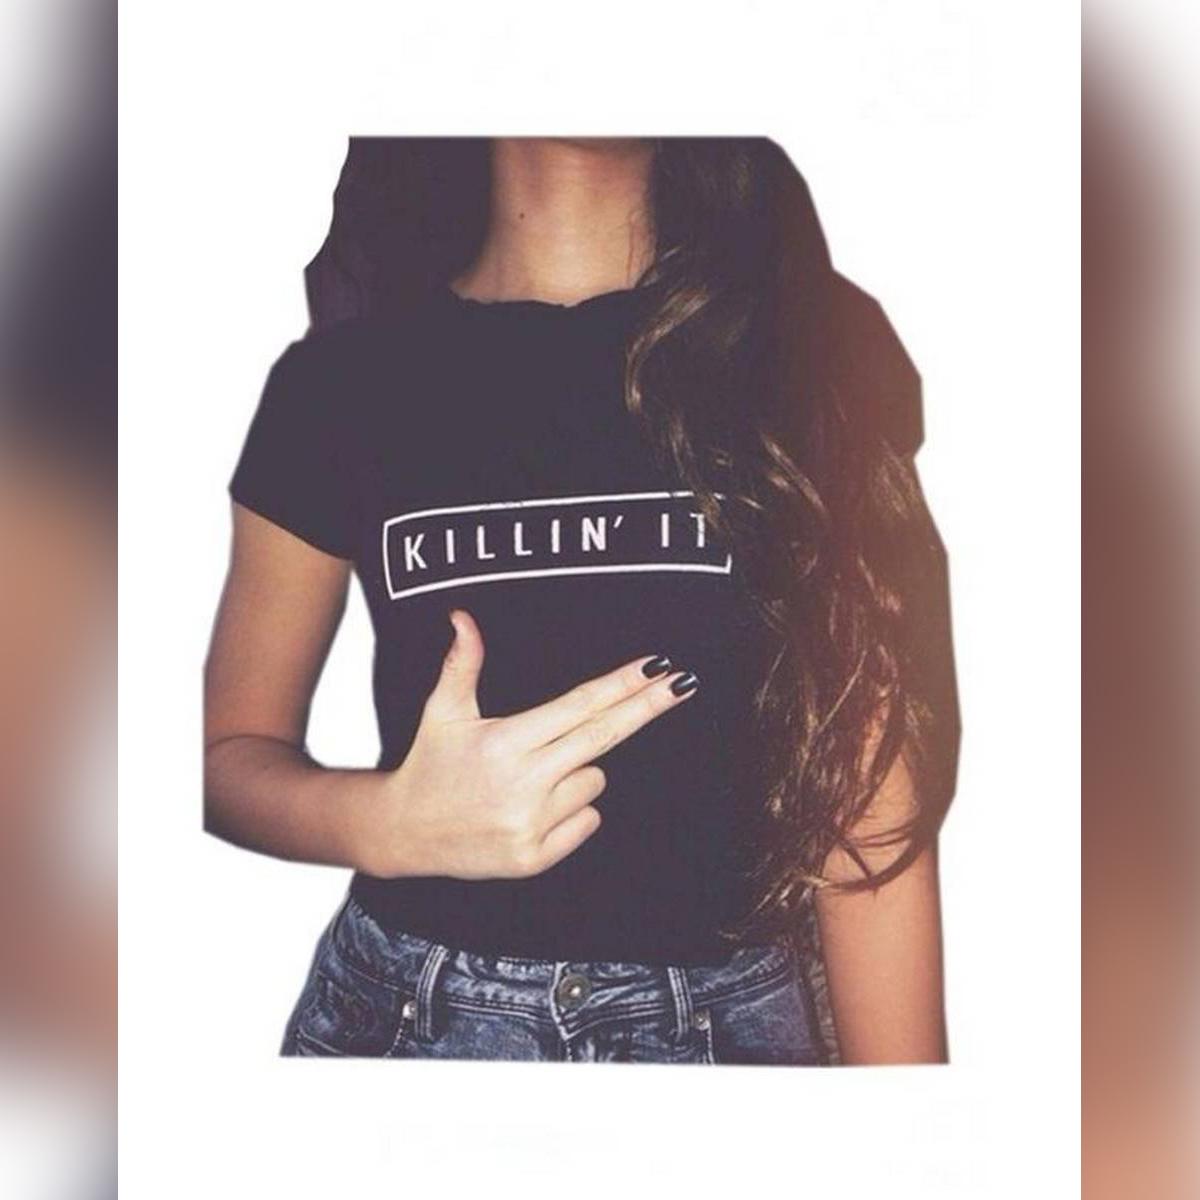 Killin it Cotton tshirt for Women T Shirt Tops White Black Short Tee for Women - 11192019